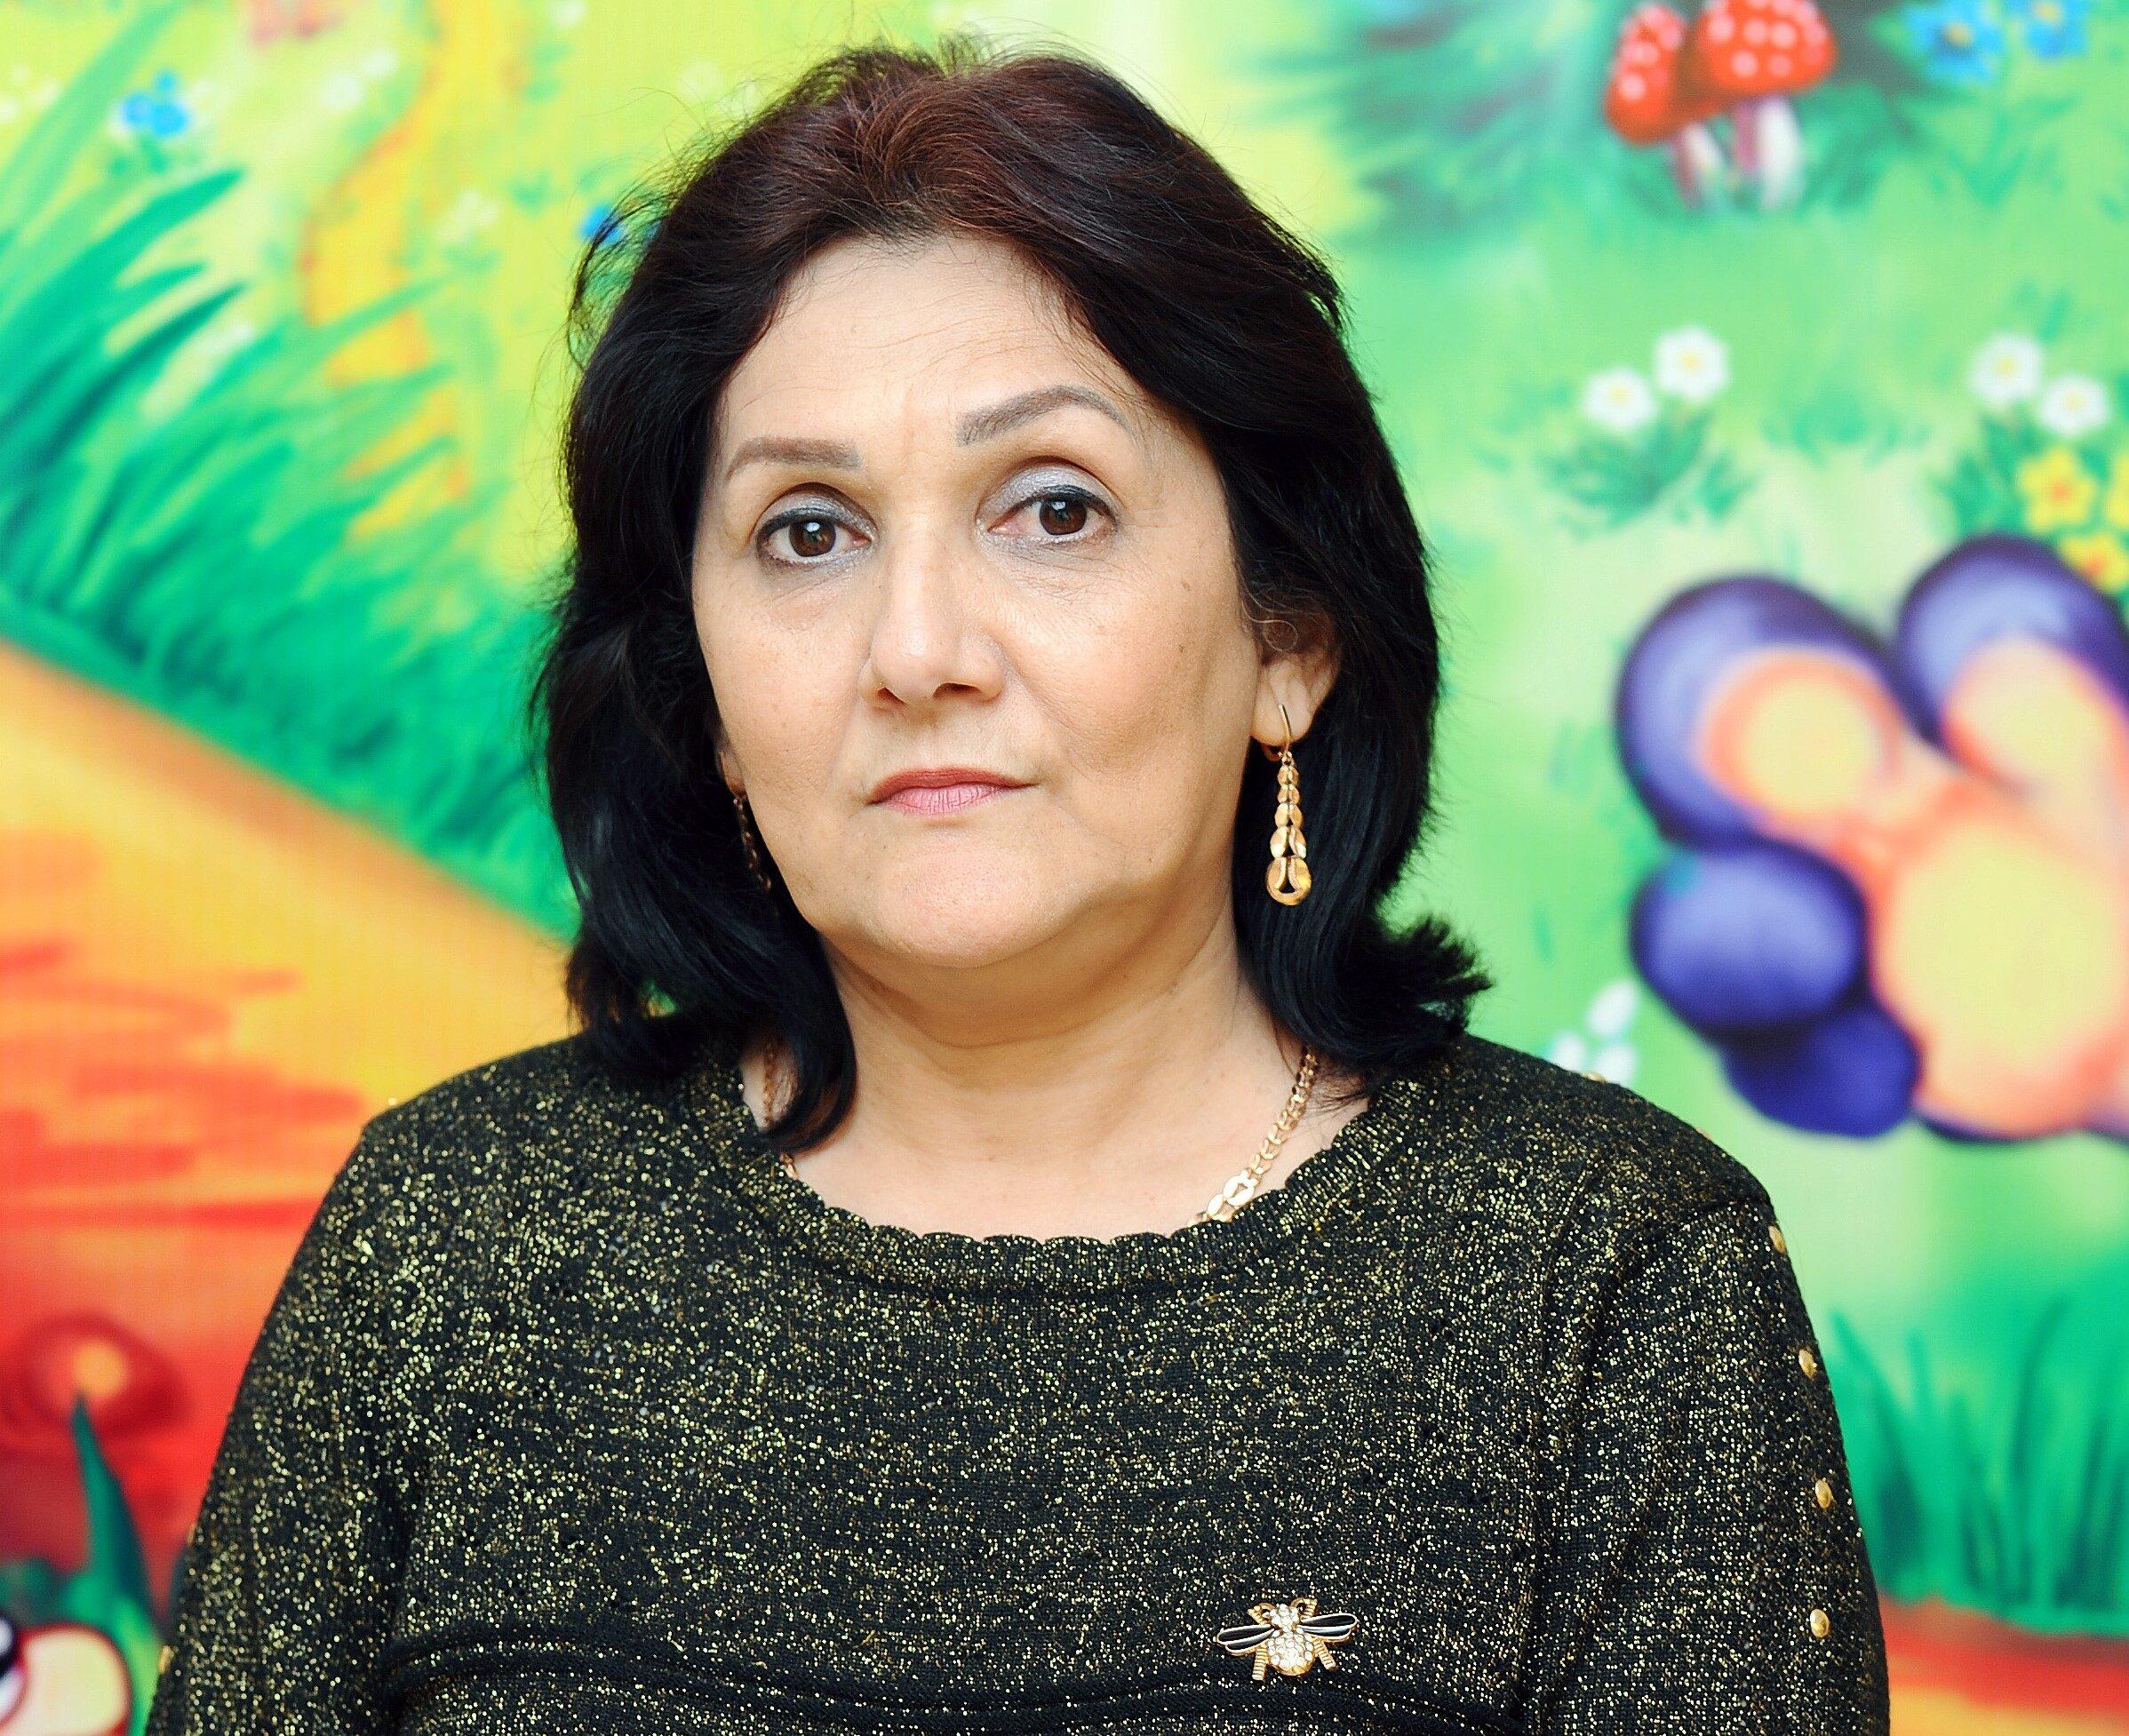 Esmira Hidayətova